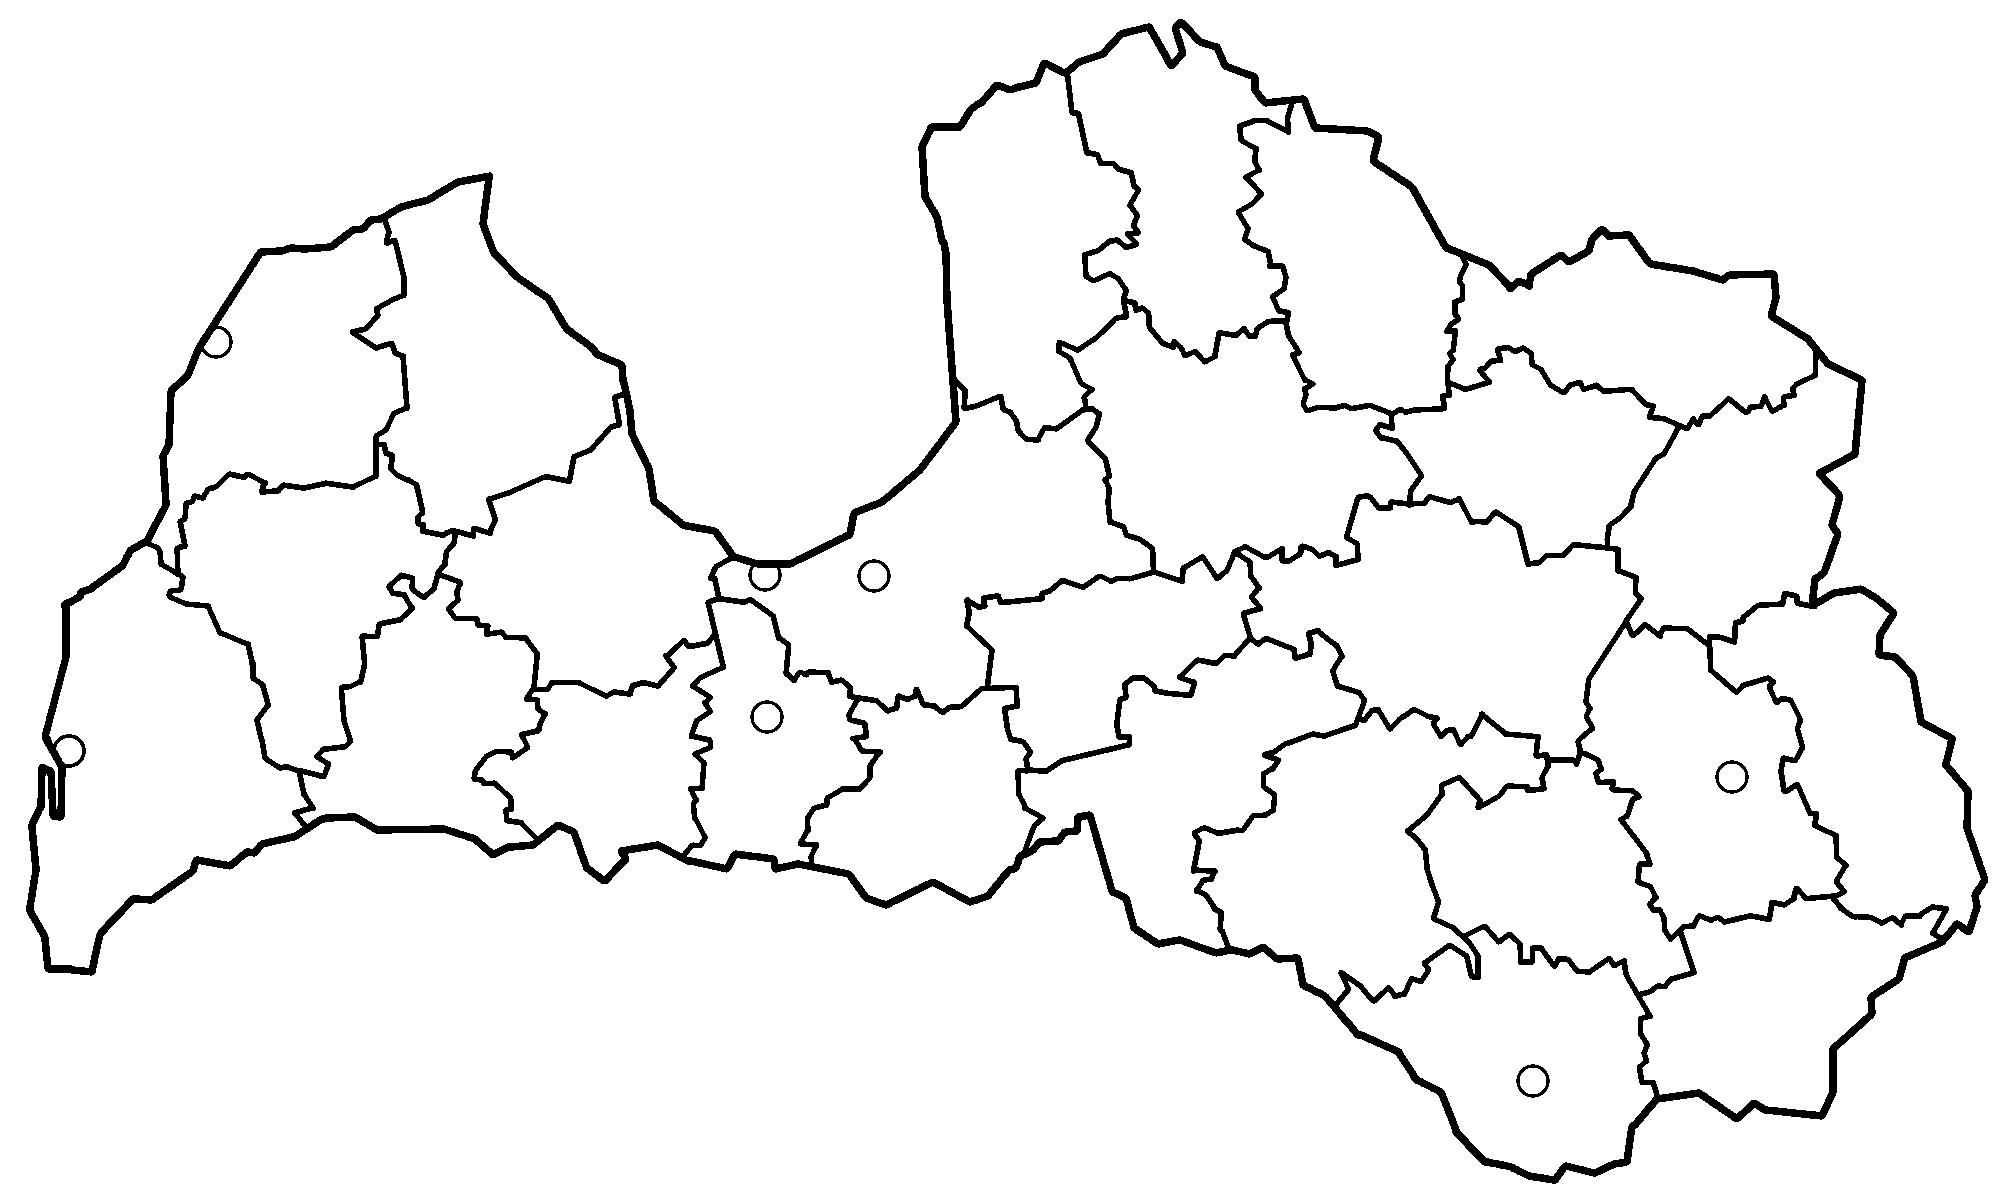 Filelatvia districts blankg wikimedia commons filelatvia districts blankg publicscrutiny Gallery